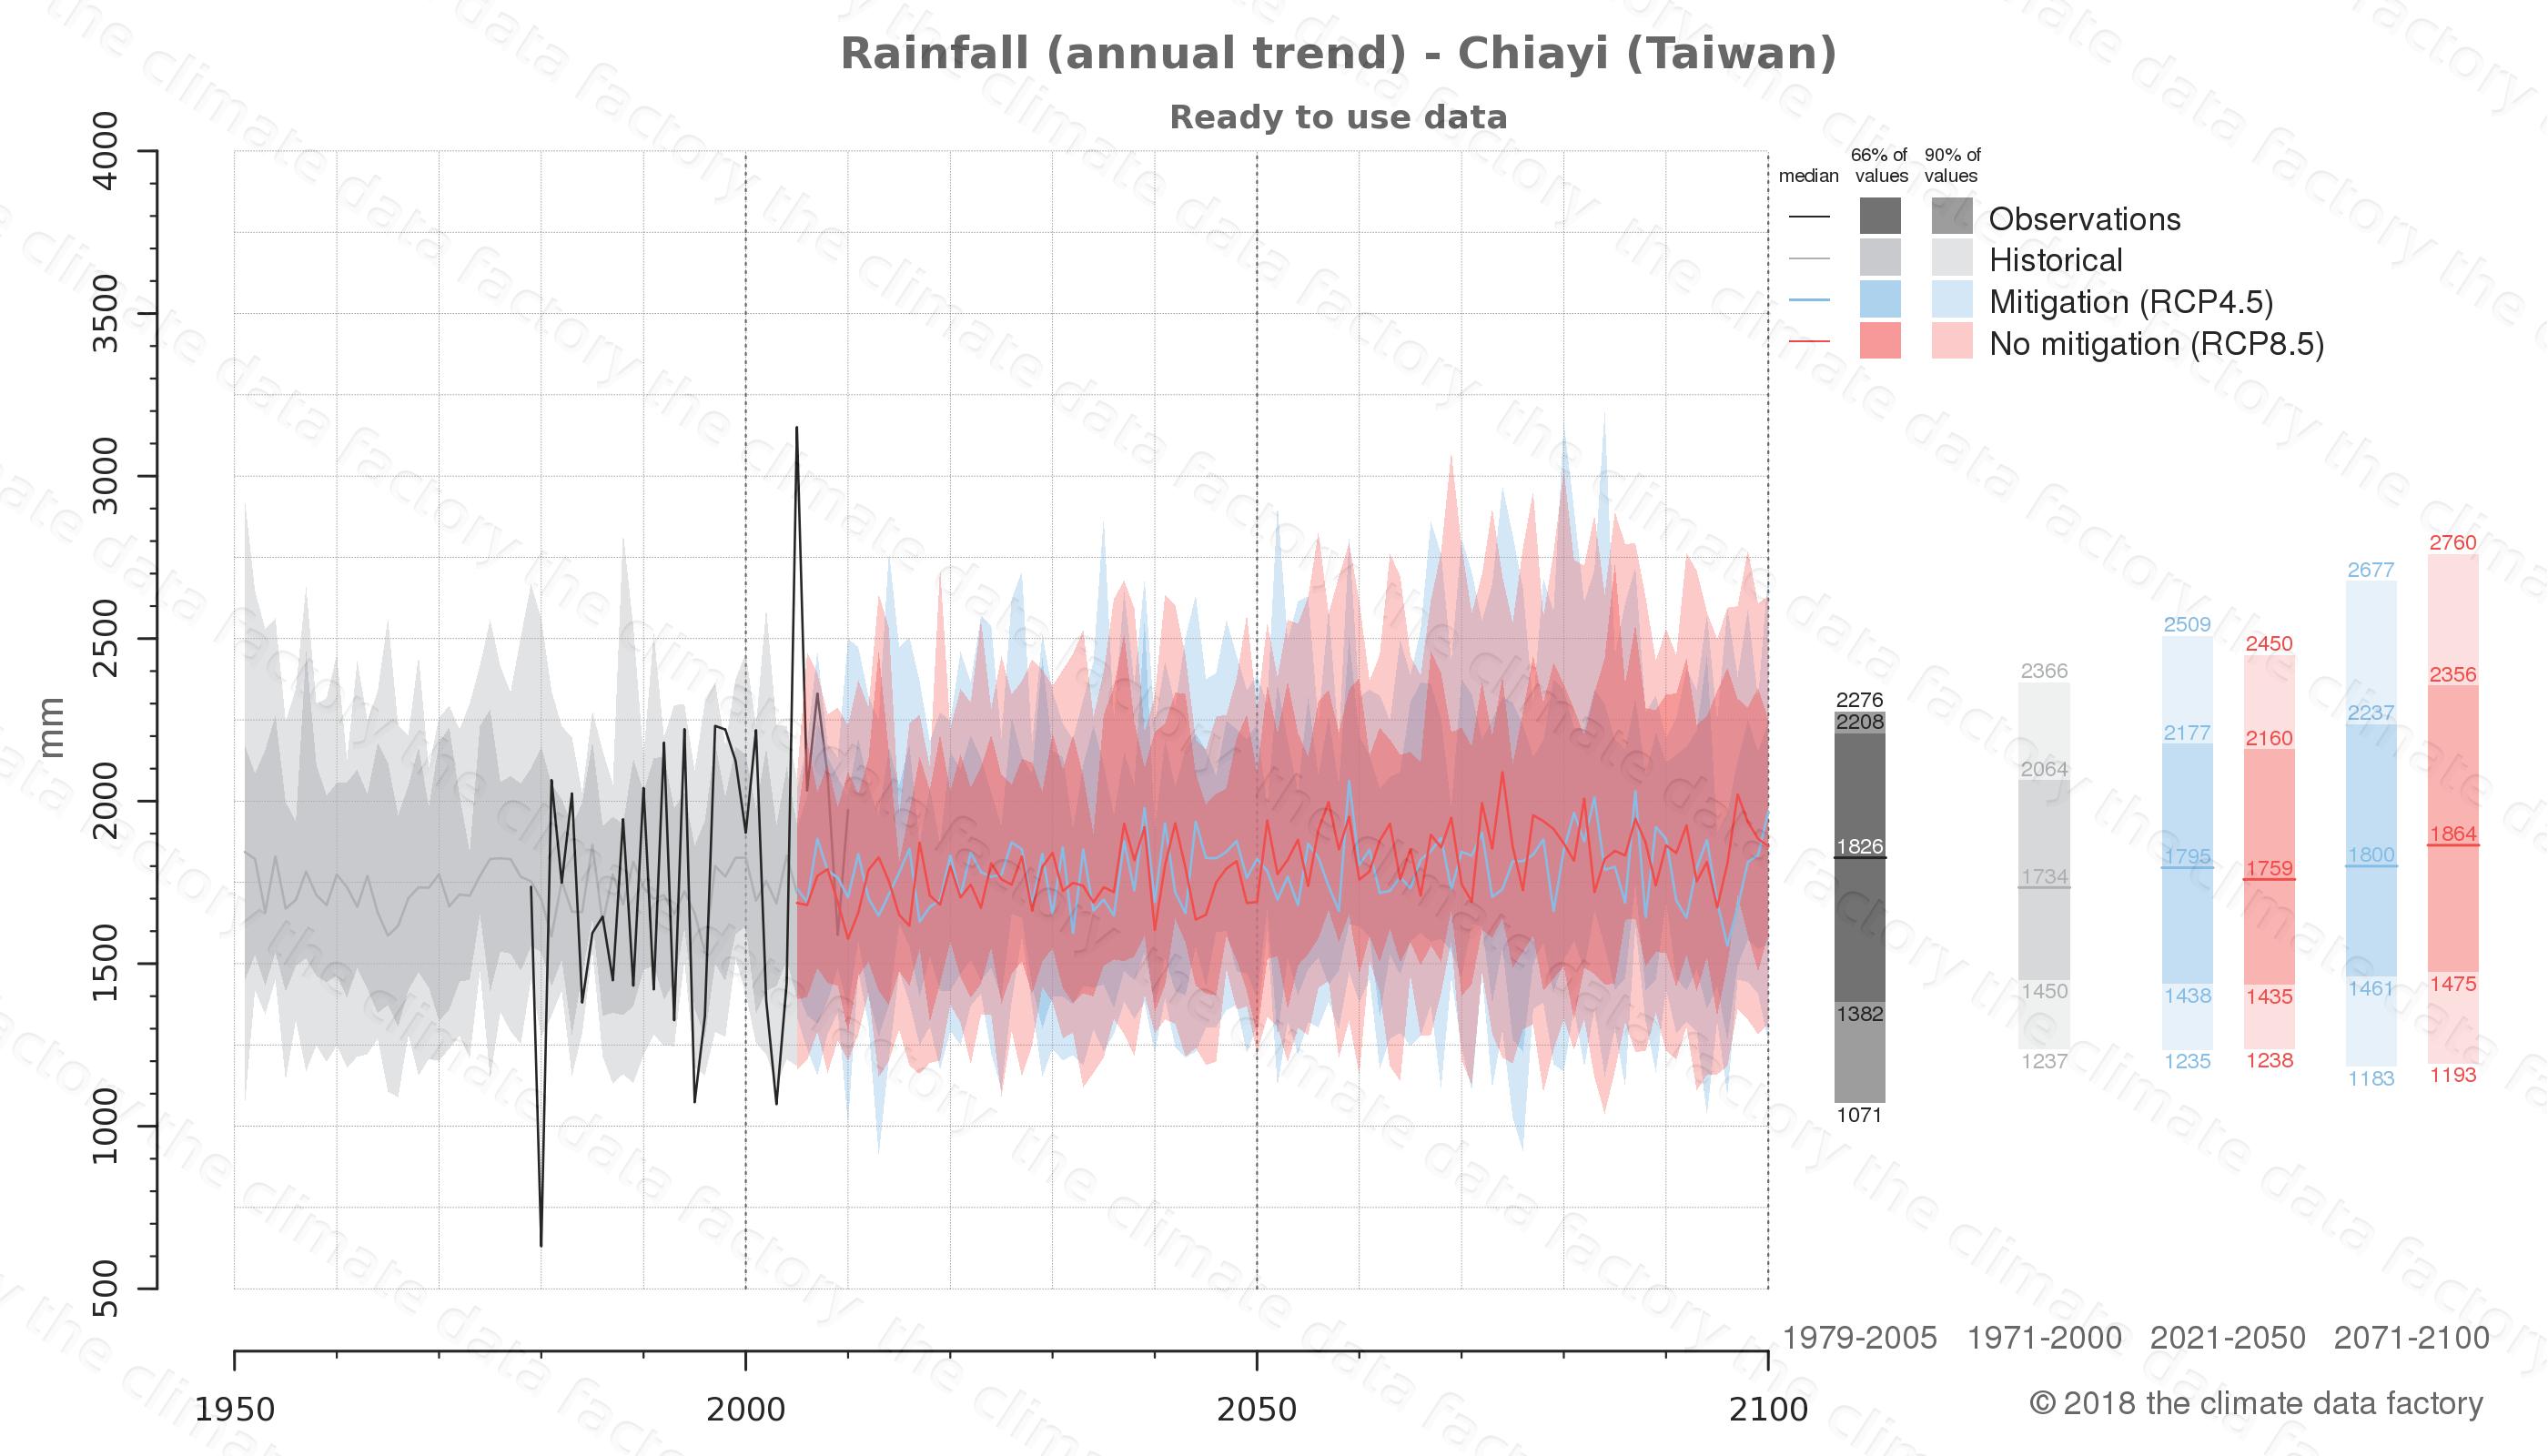 climate change data policy adaptation climate graph city data rainfall chiayi taiwan